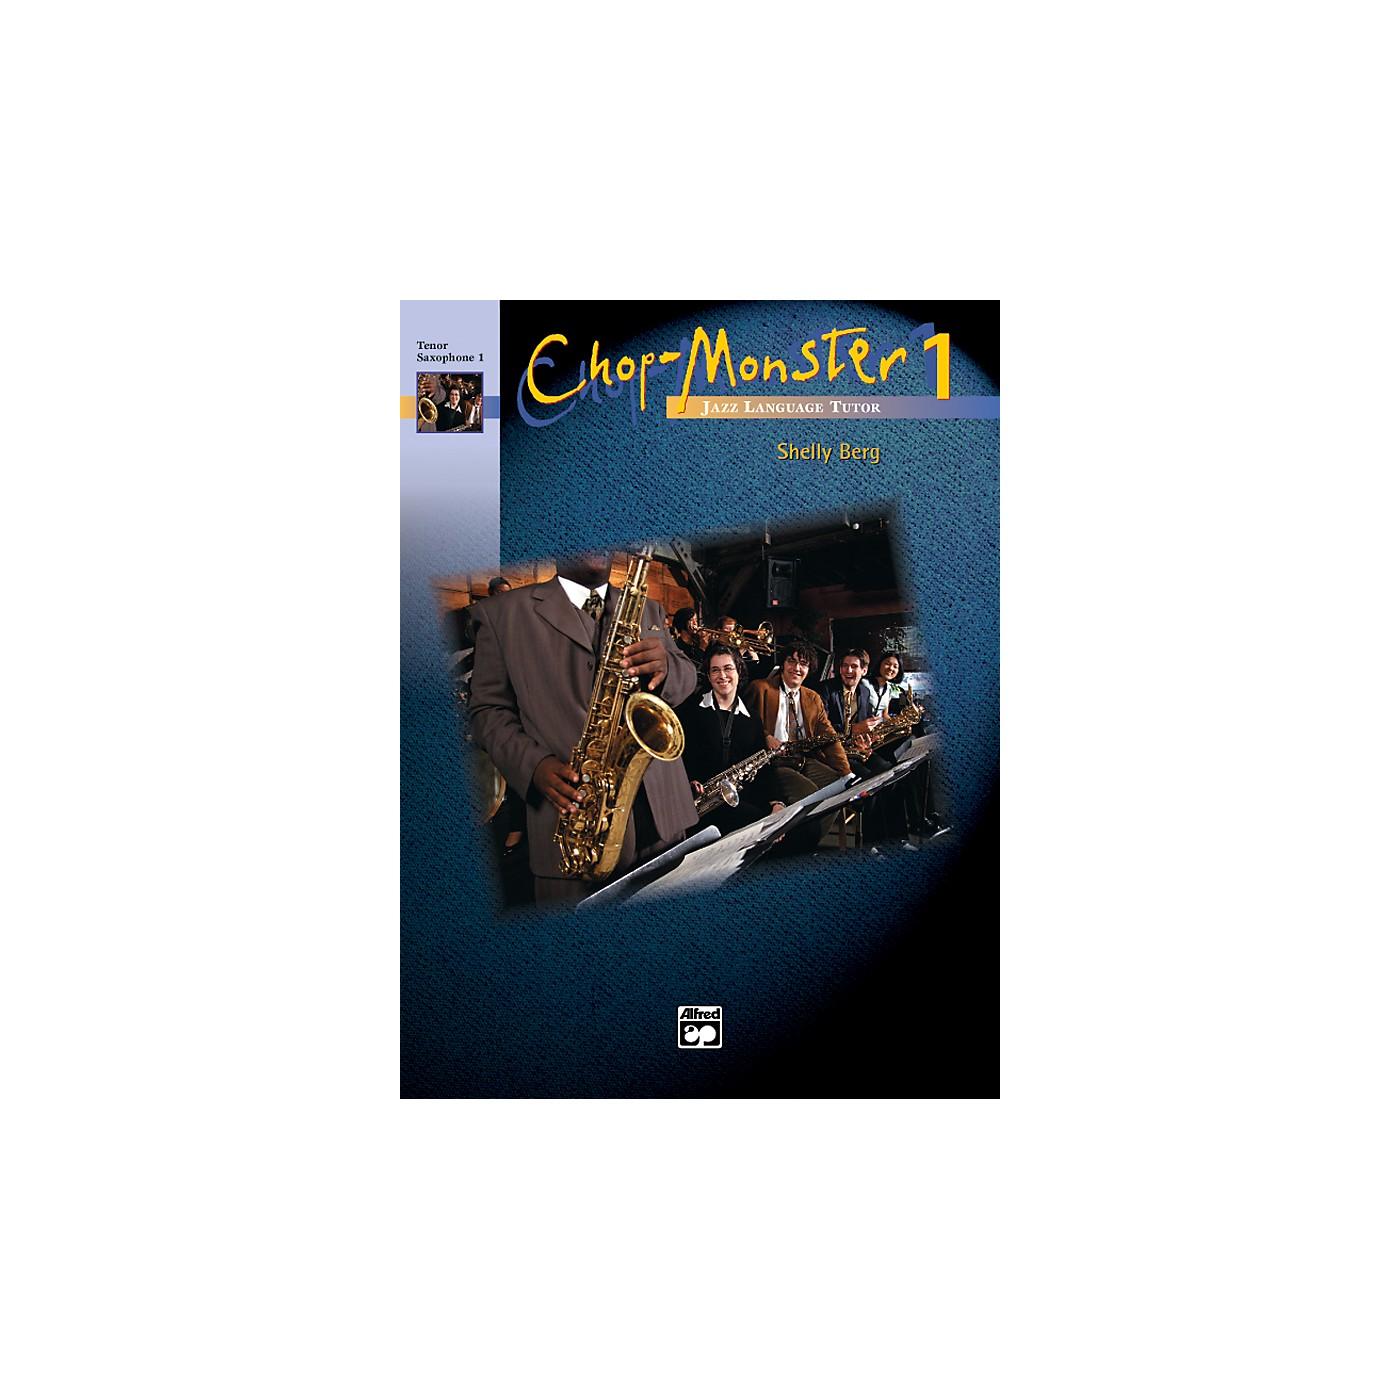 Alfred Chop-Monster Book 1 Tenor Saxophone 1 Book & CD thumbnail